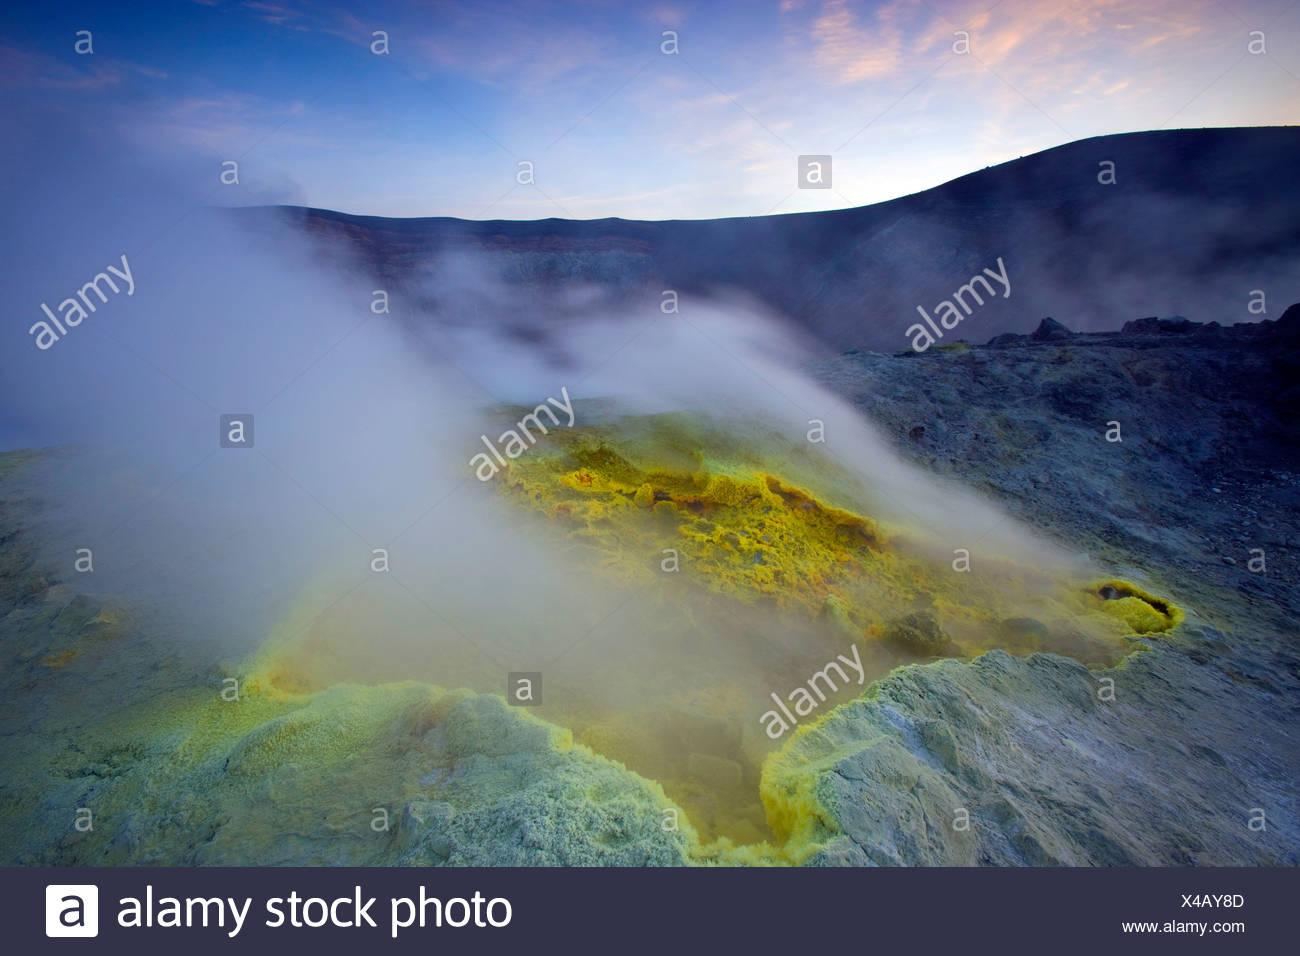 Vulcano, Italien, Europa, Liparischen Inseln, Insel, Insel, Vulkan, Krater, Fumarole, Schwefel, Schwefel, Ablagerung, Dampf, Dunst, sogar Stockbild